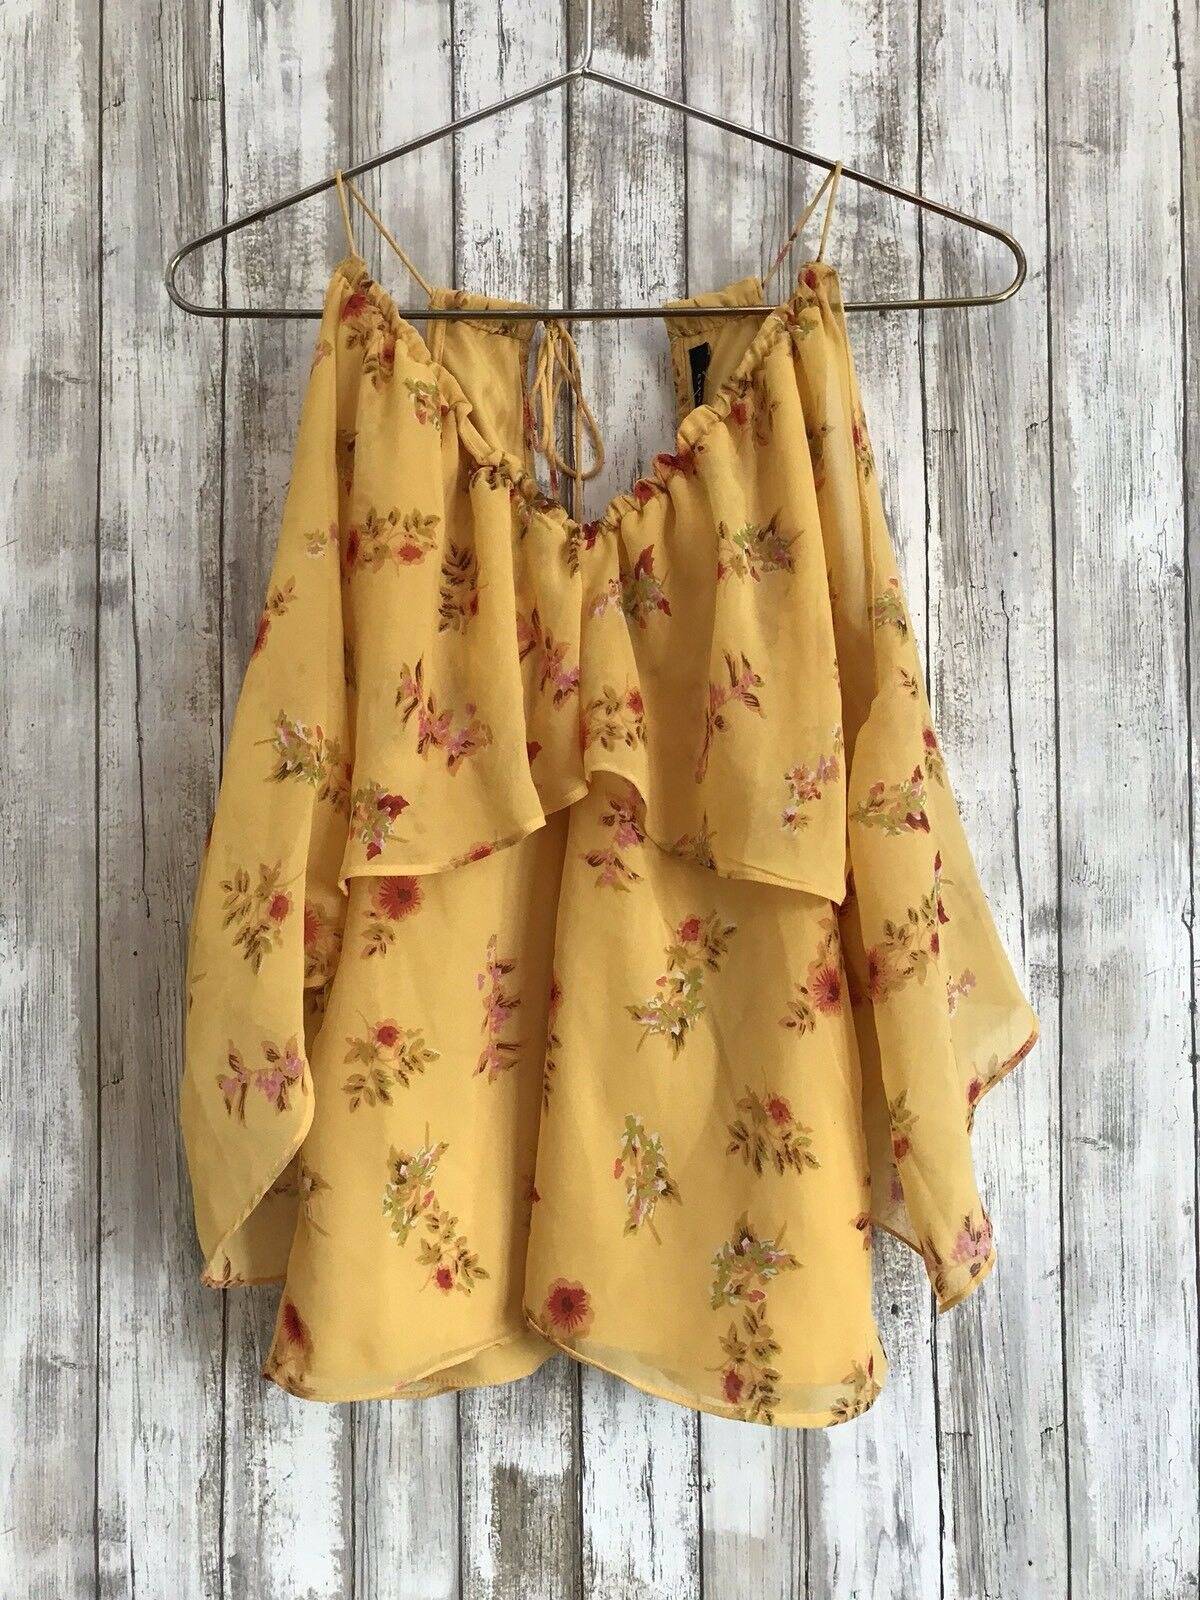 WALTER BAKER Saundra Cold Shoulder Ruffle Gelb Floral Blouse Top M Medium